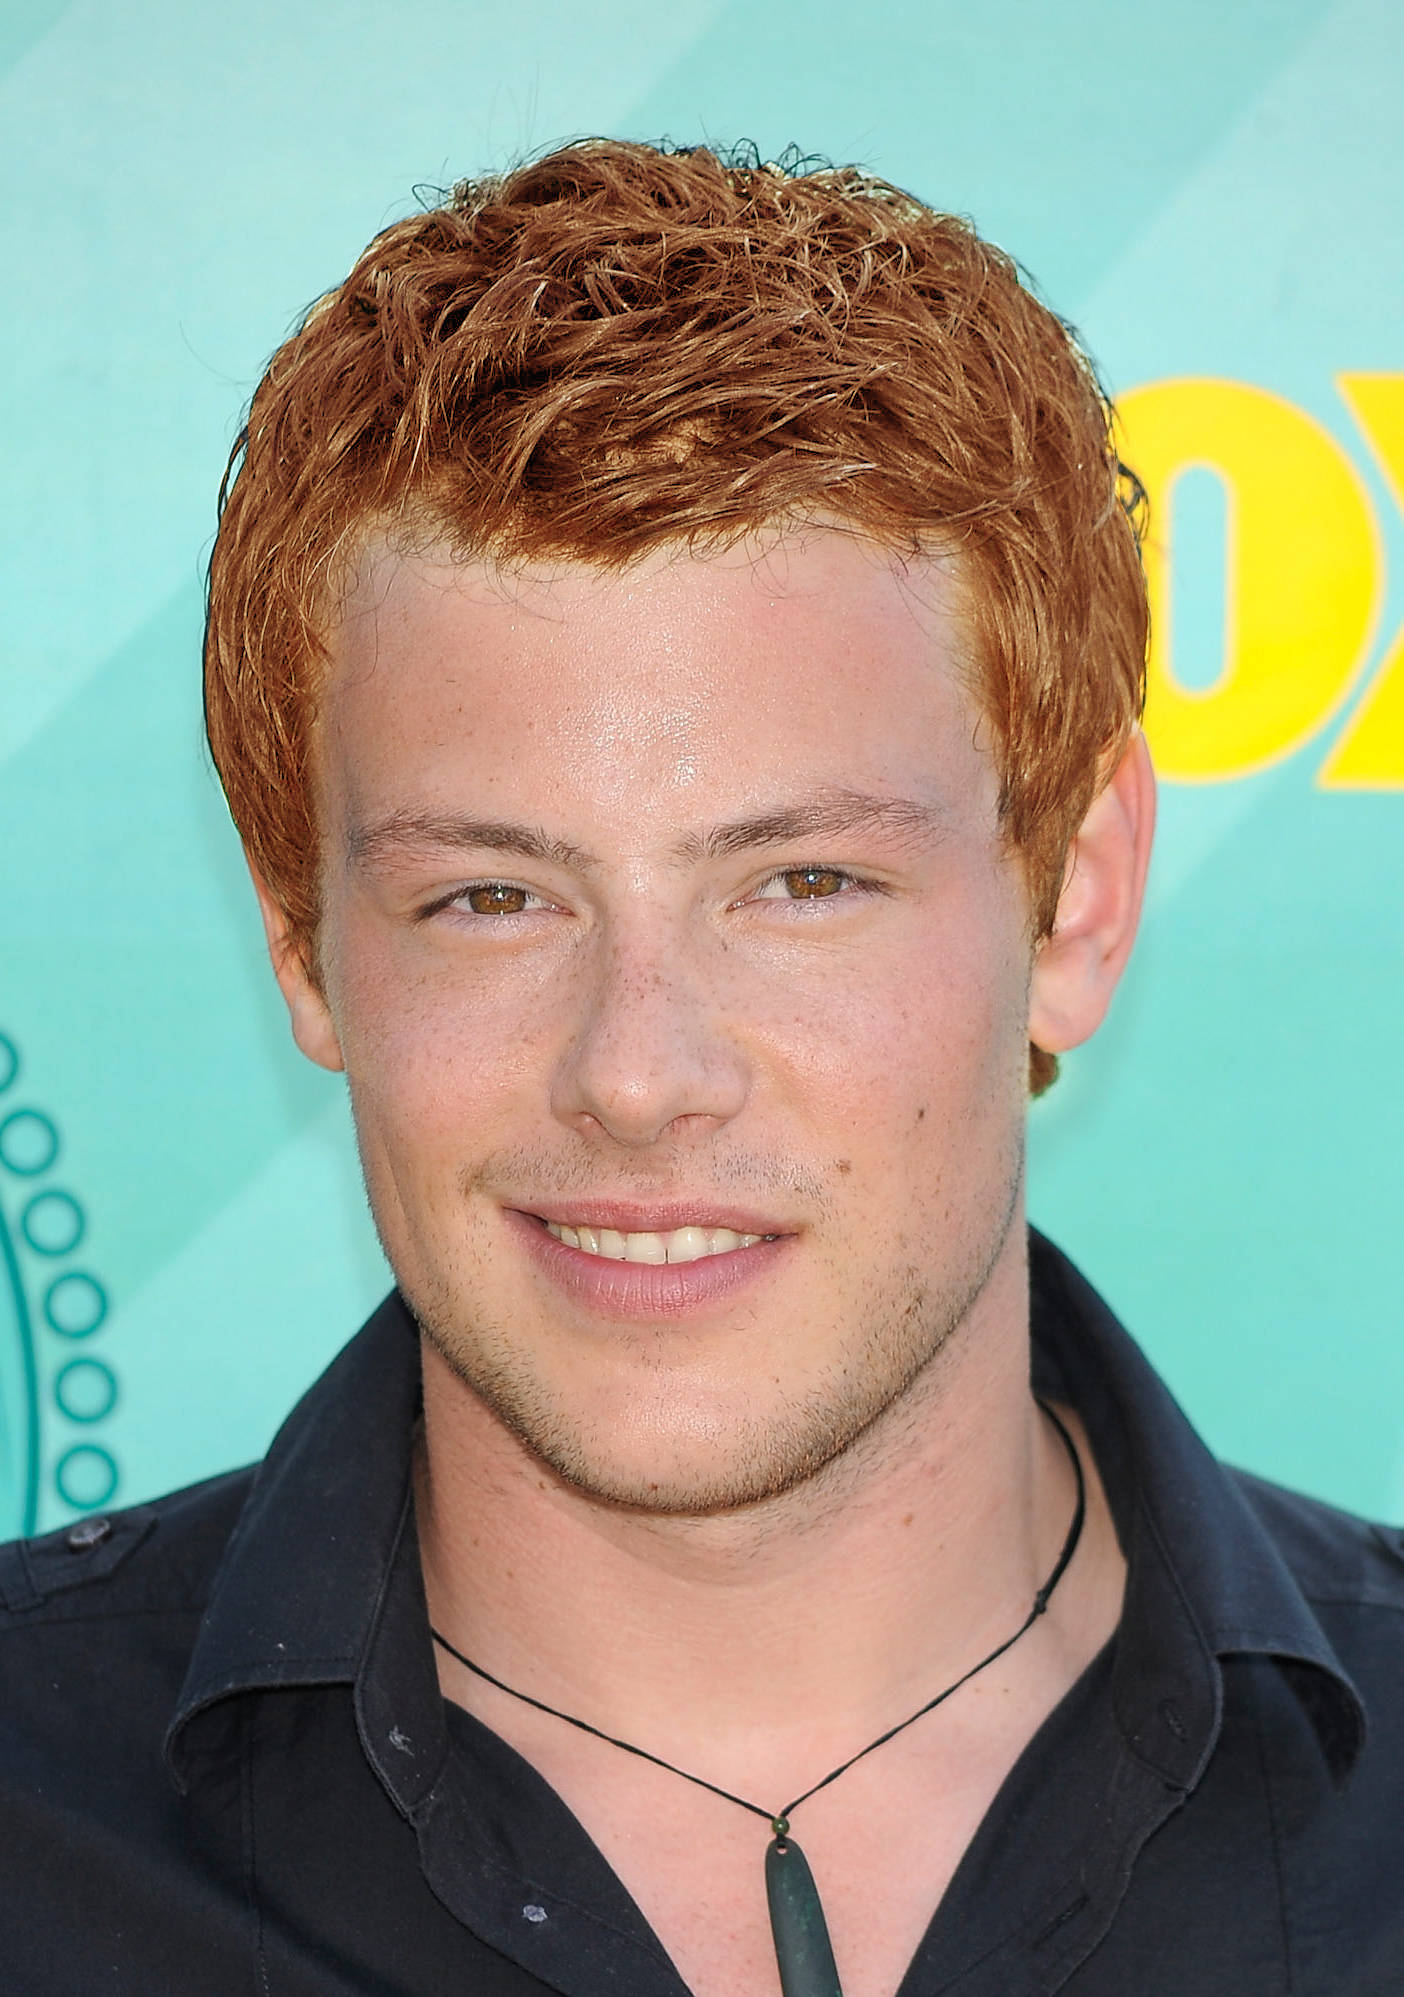 Charlie Weasley - Ab Imo Pectore WikiCharlie Weasley Actor